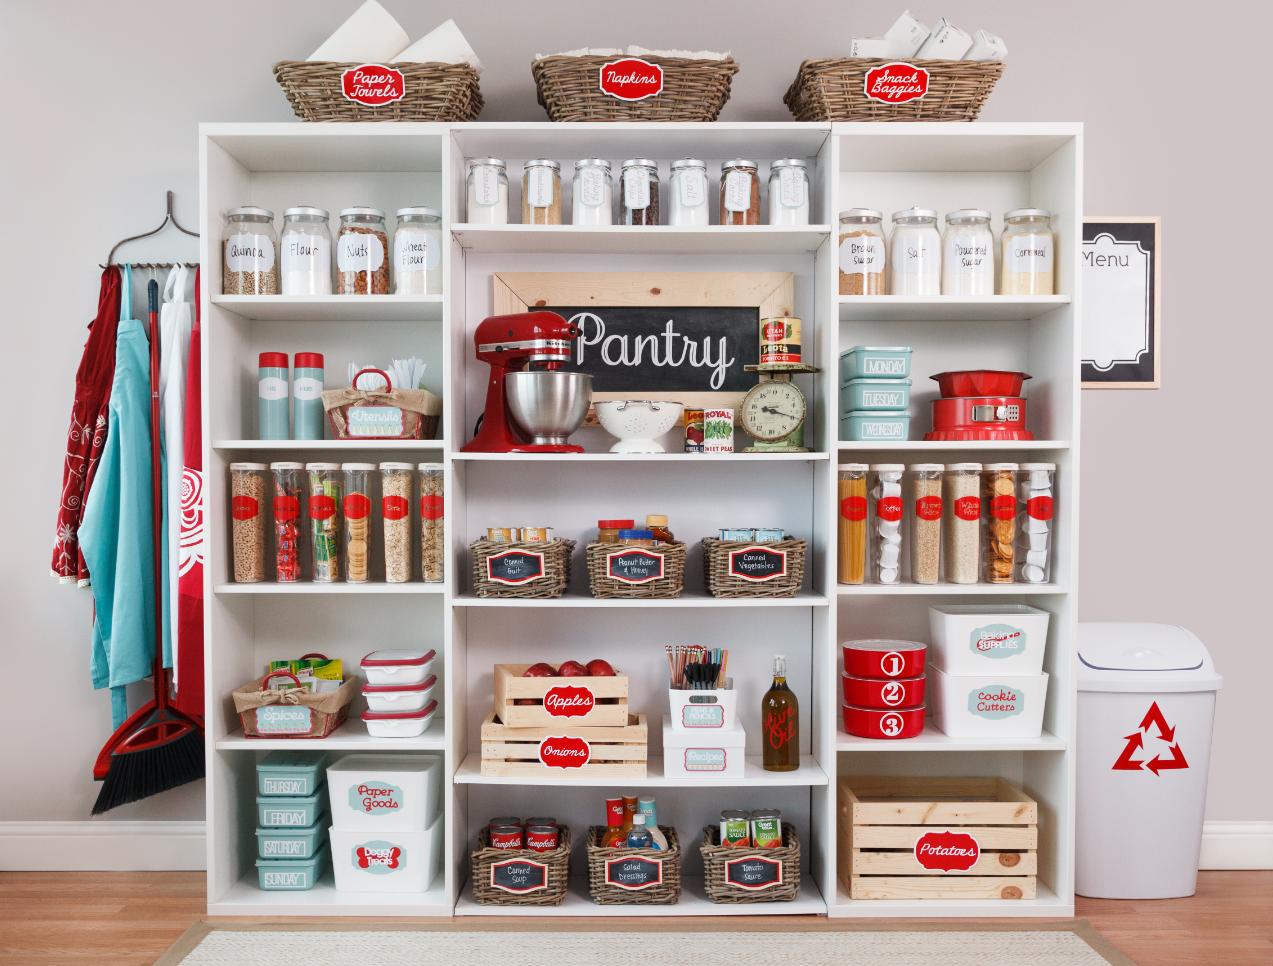 Michelle Starkey »7 Home Organization Tools That Work Wonders!  FSWHHQT